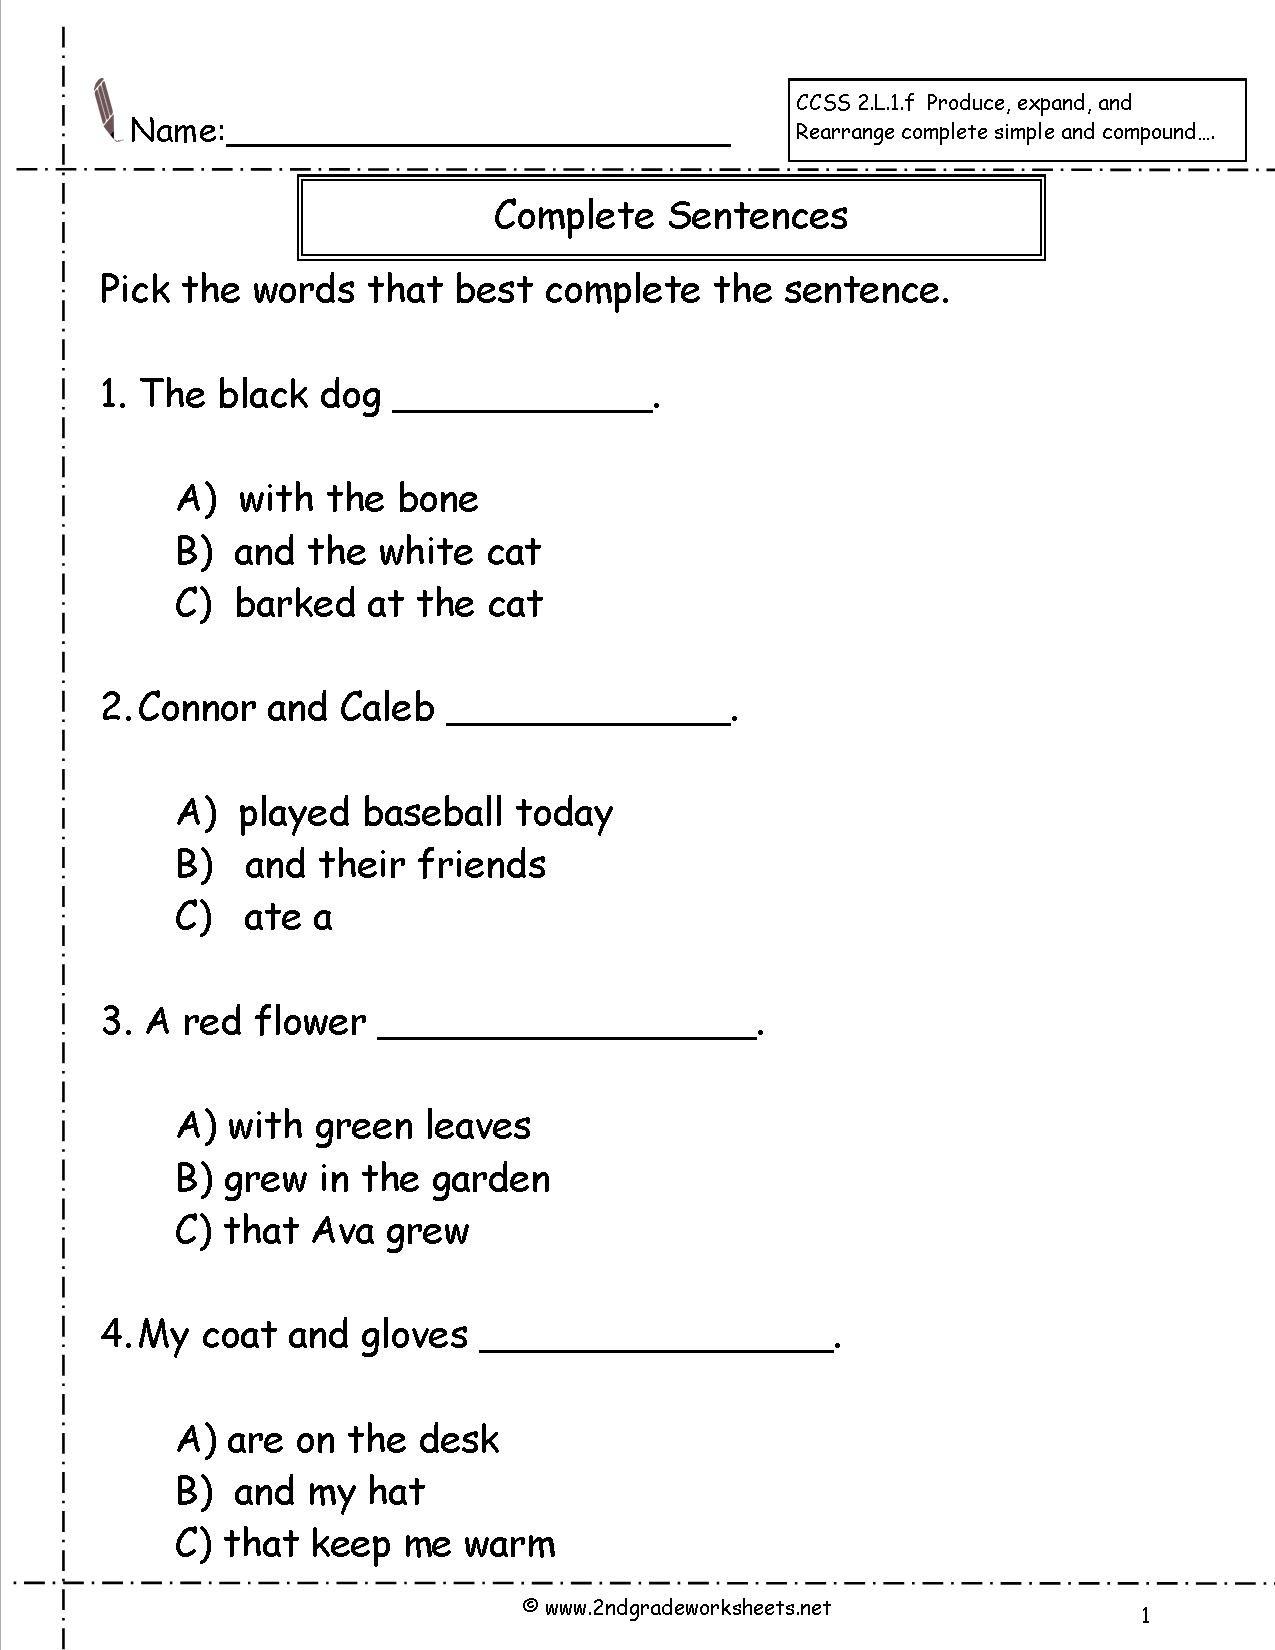 Complete Sentences Worksheet 4th Grade Second Grade Sentences Worksheets Ccss 2 L 1 F Worksheets